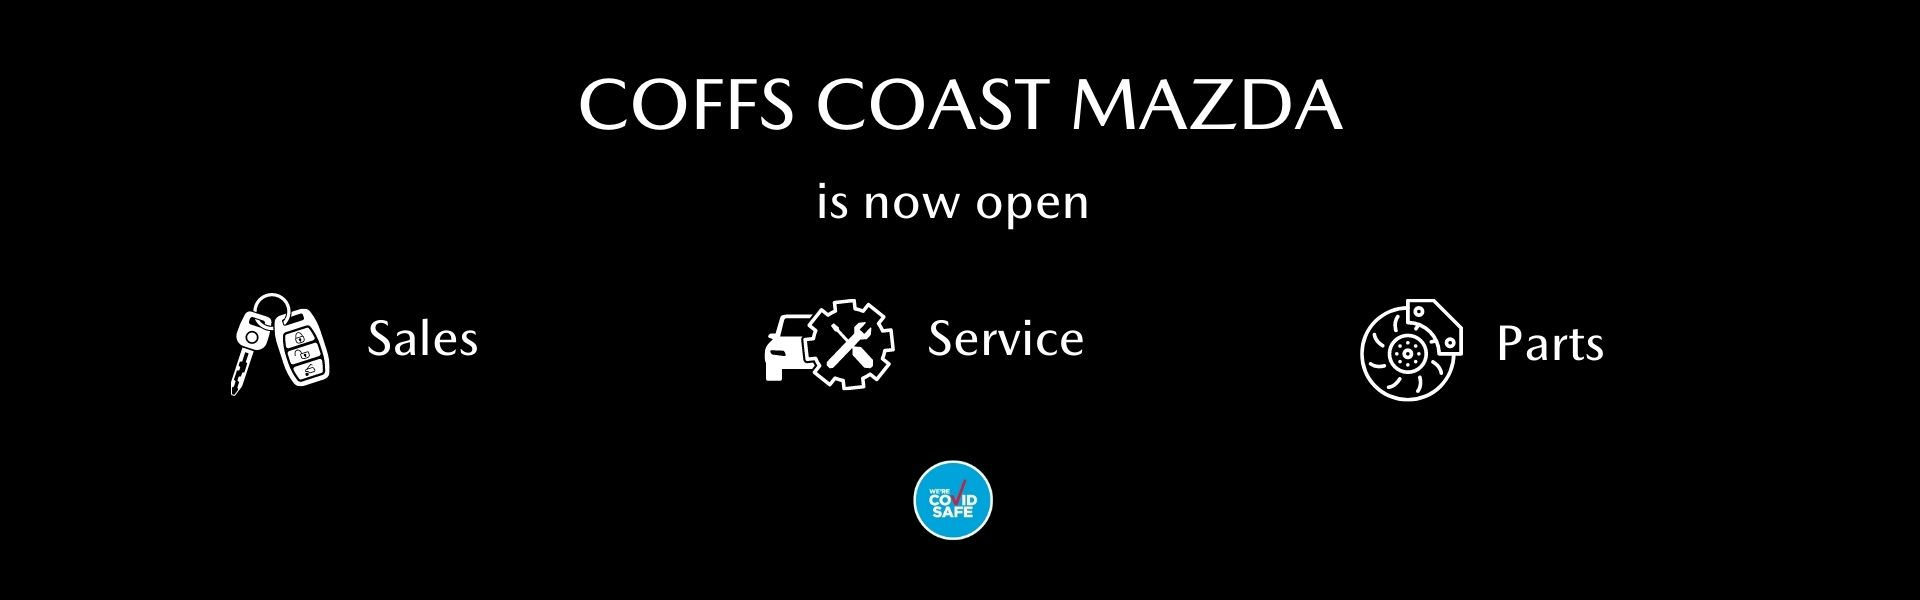 Coffs Coast Mazda now open